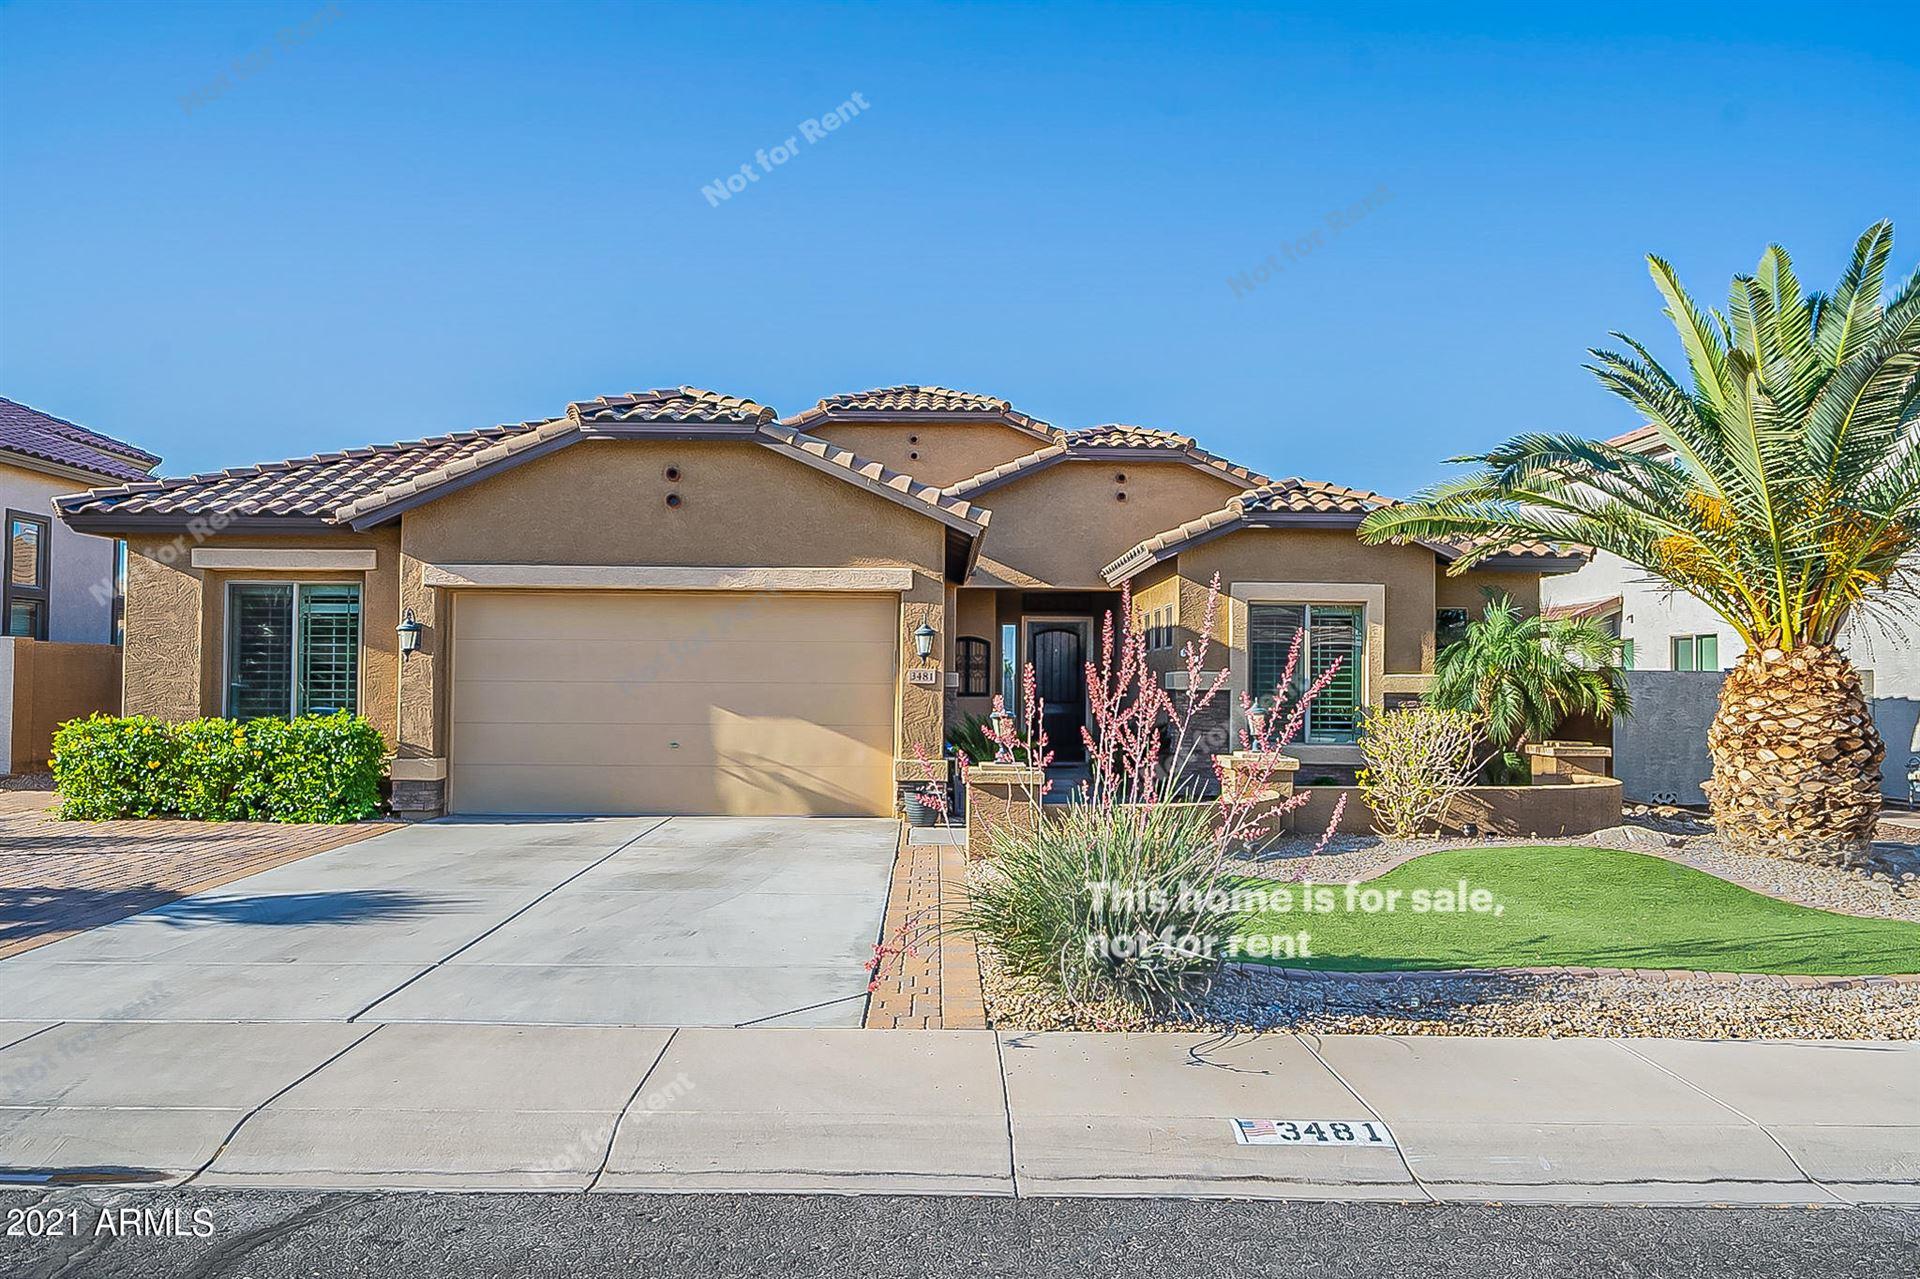 Photo of 3481 E ISAIAH Avenue, Gilbert, AZ 85298 (MLS # 6232547)